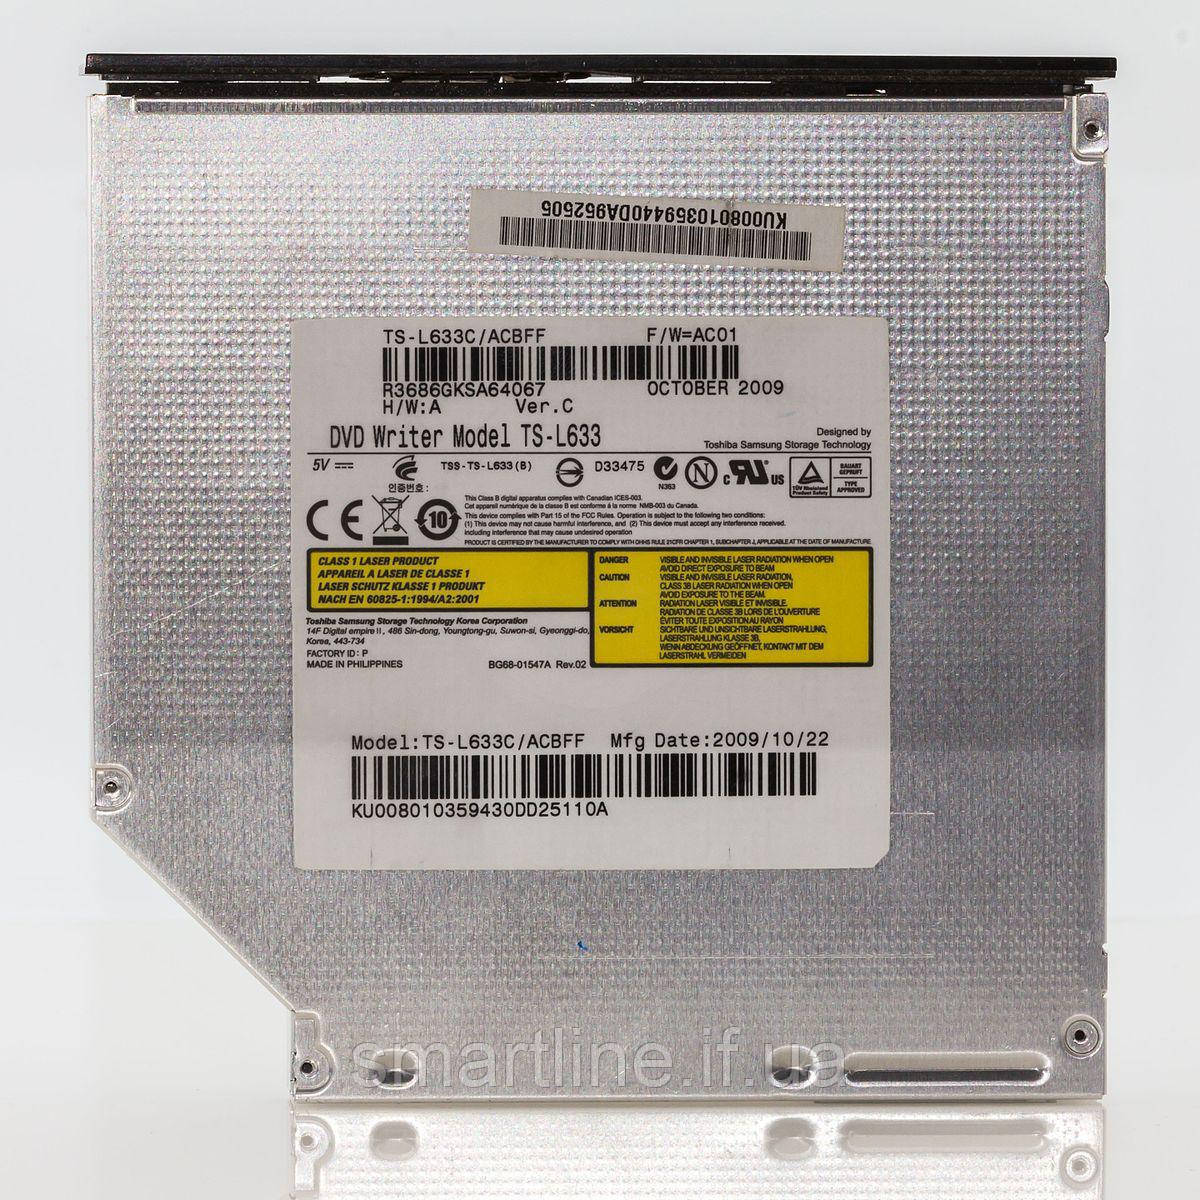 Toshiba DVD R/RW Drive TS-H552 Samsung D33475 B 8.5GB 6GGXC03134 GA02